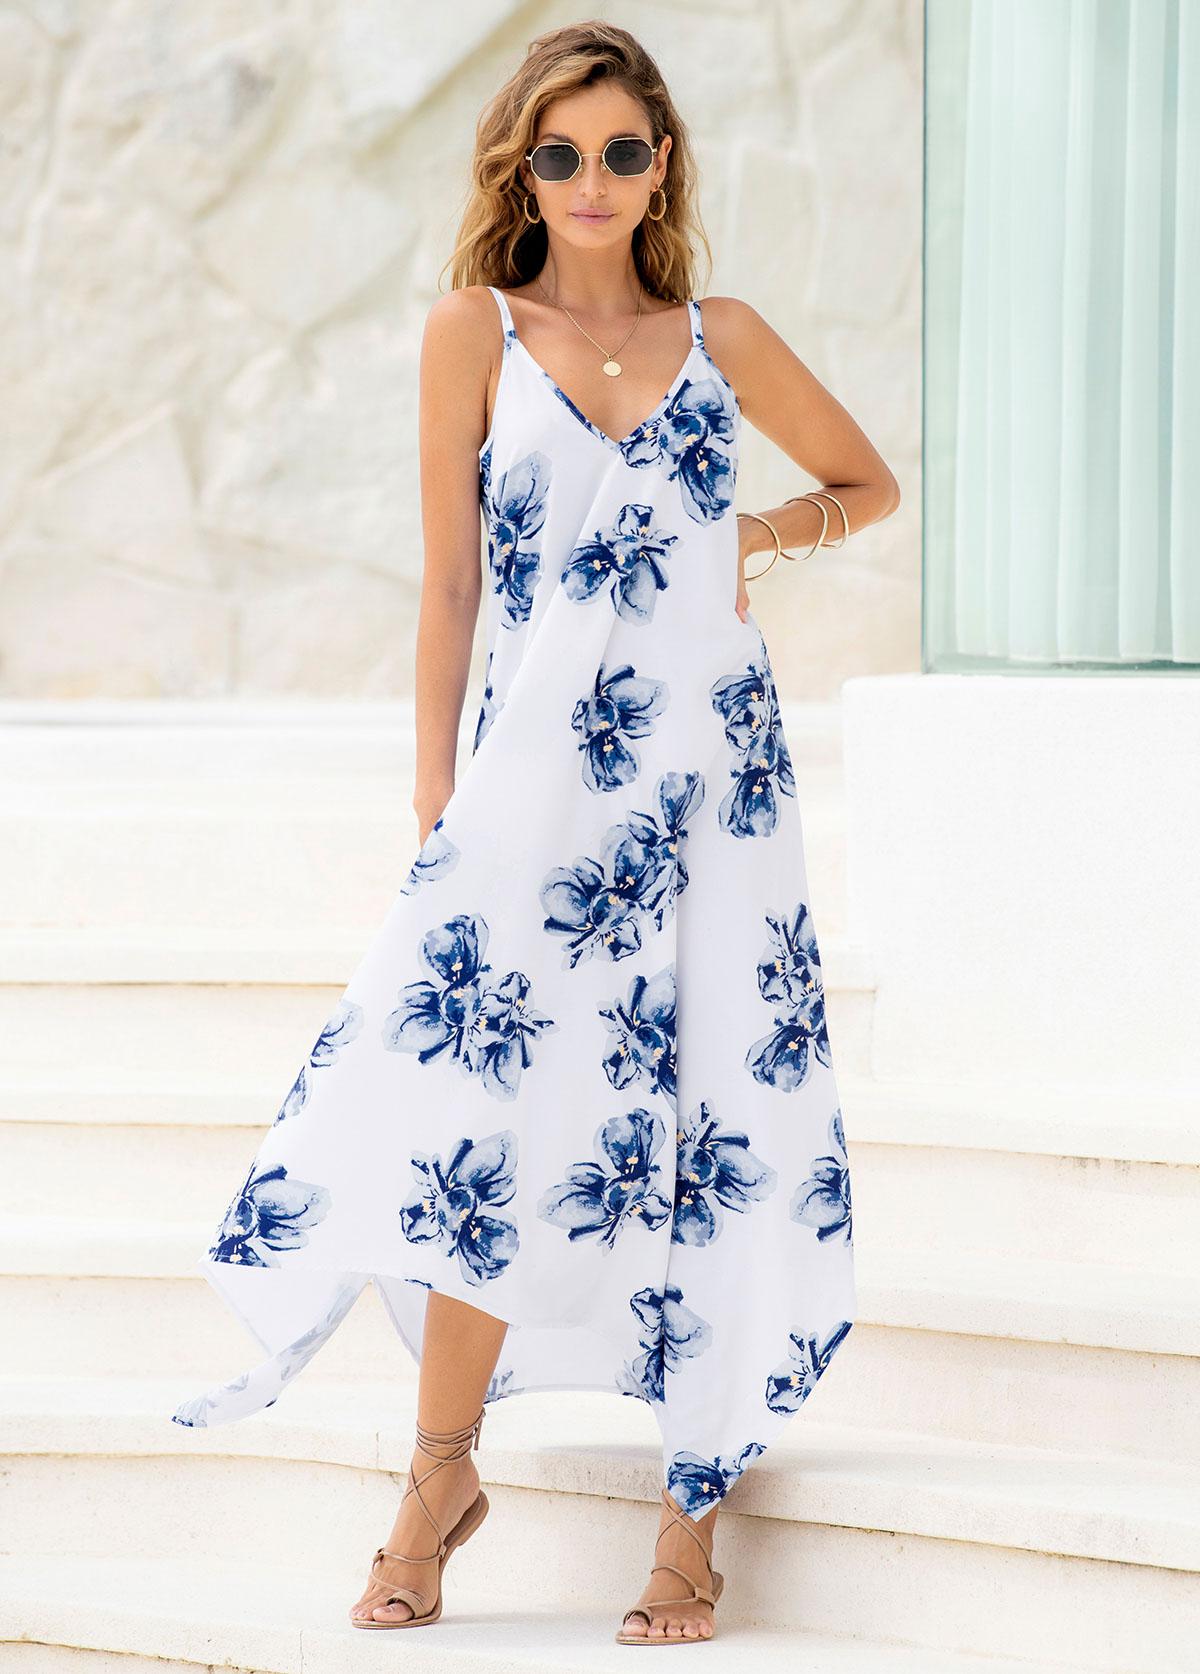 ROTITA Asymmetric Hem Spaghetti Strap Floral Print Dress